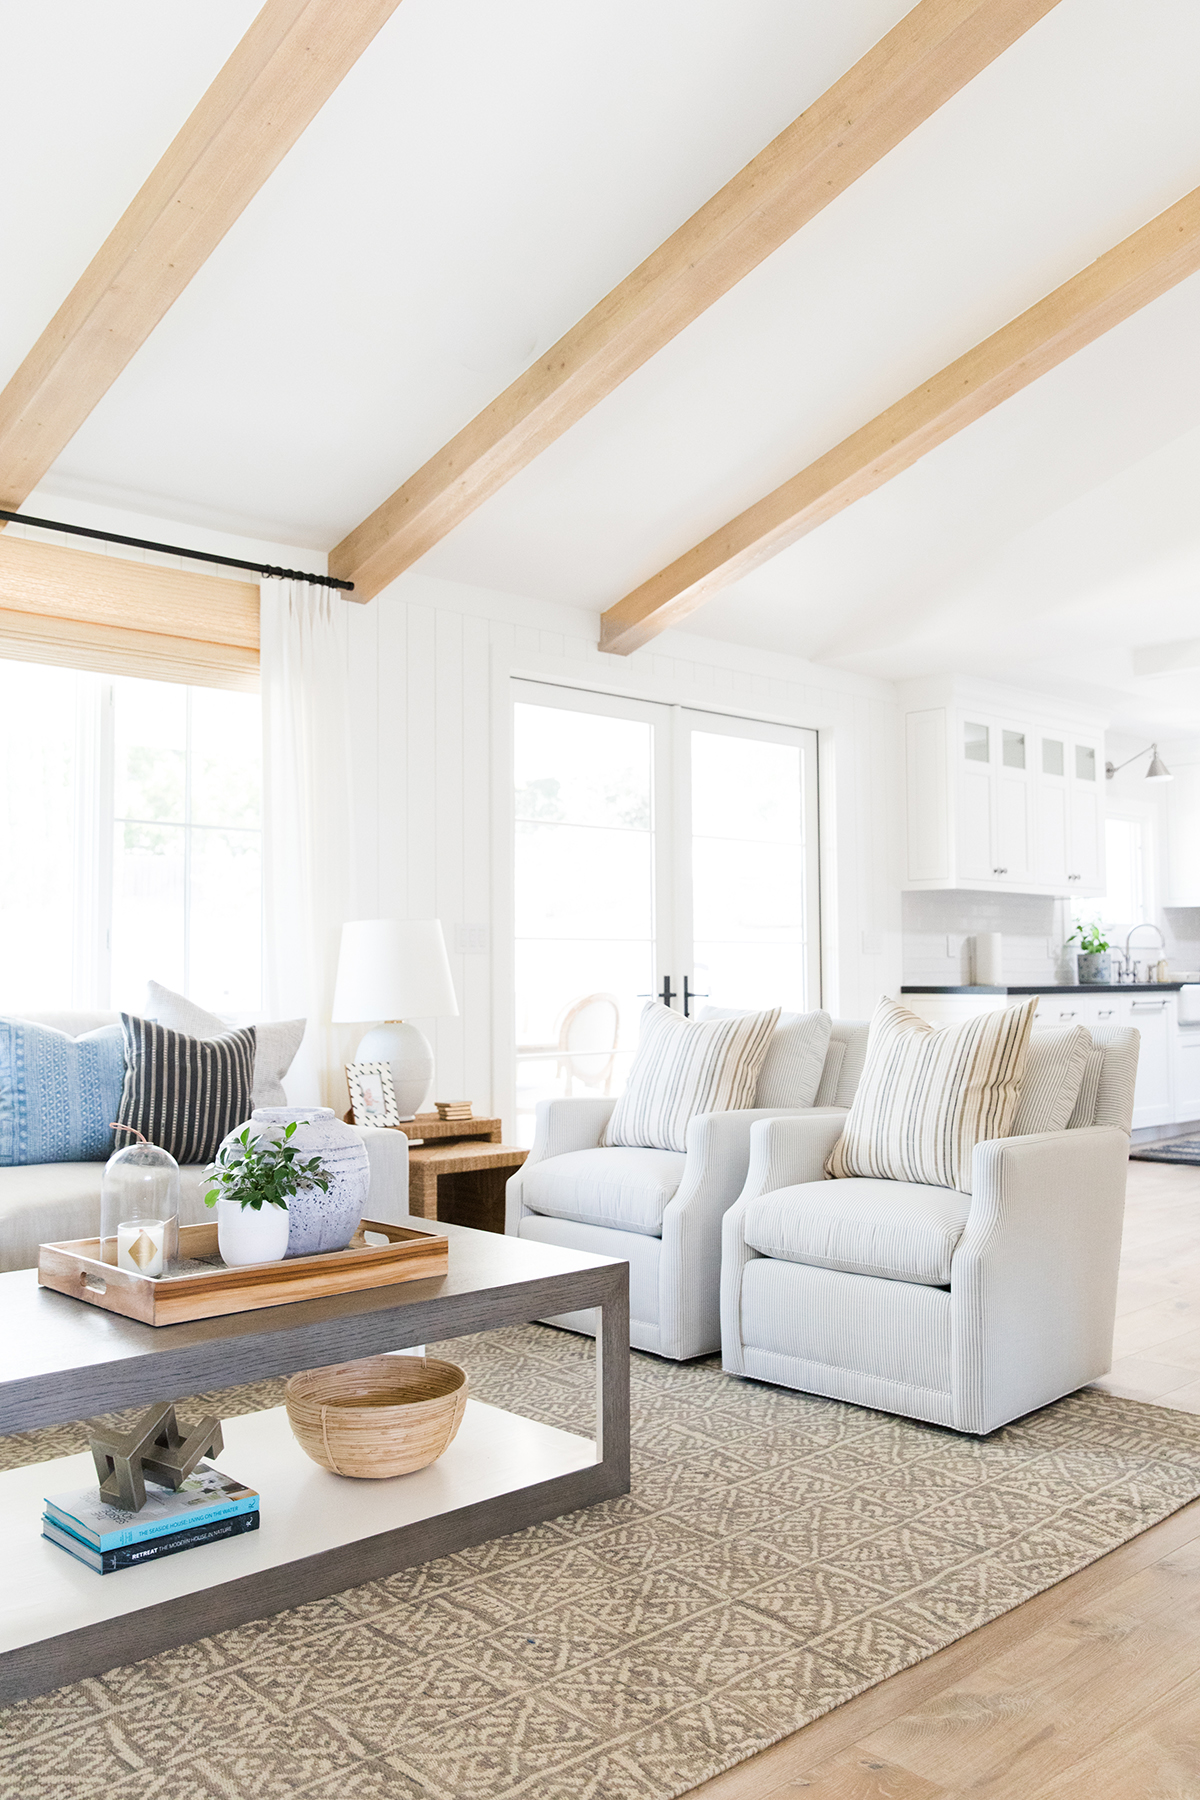 Moody coastal living room with roman shades and exposed beams.jpg